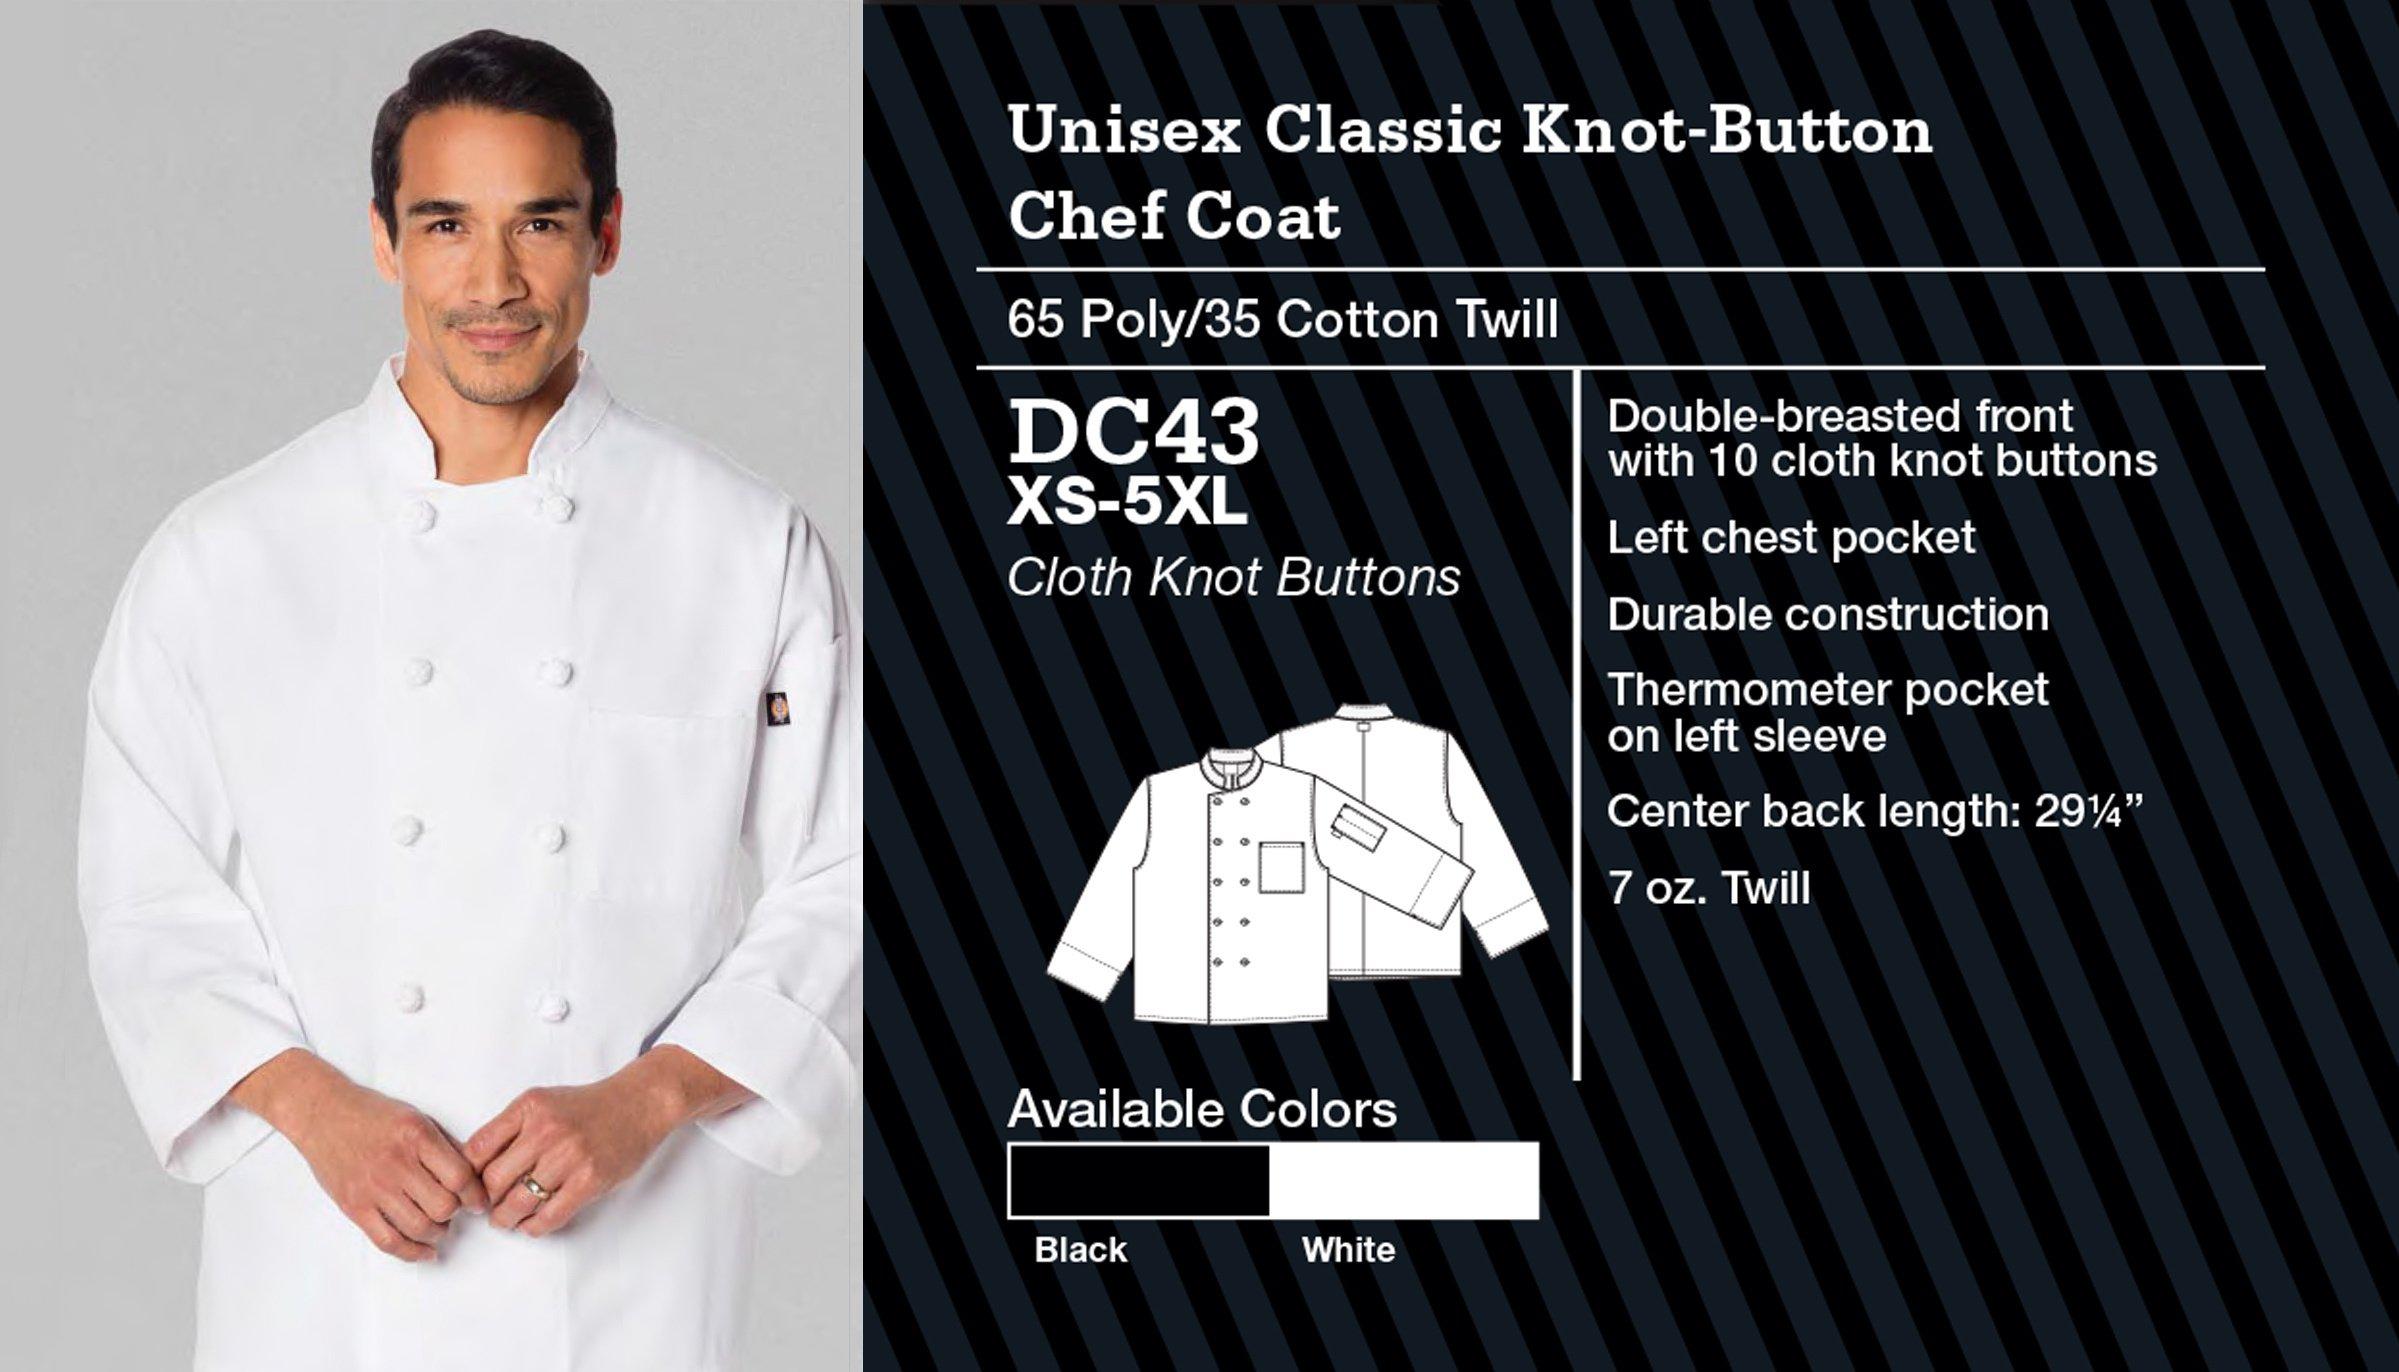 Abrigo de Chef Clásico Unisex, Botón de nudo. DC43.